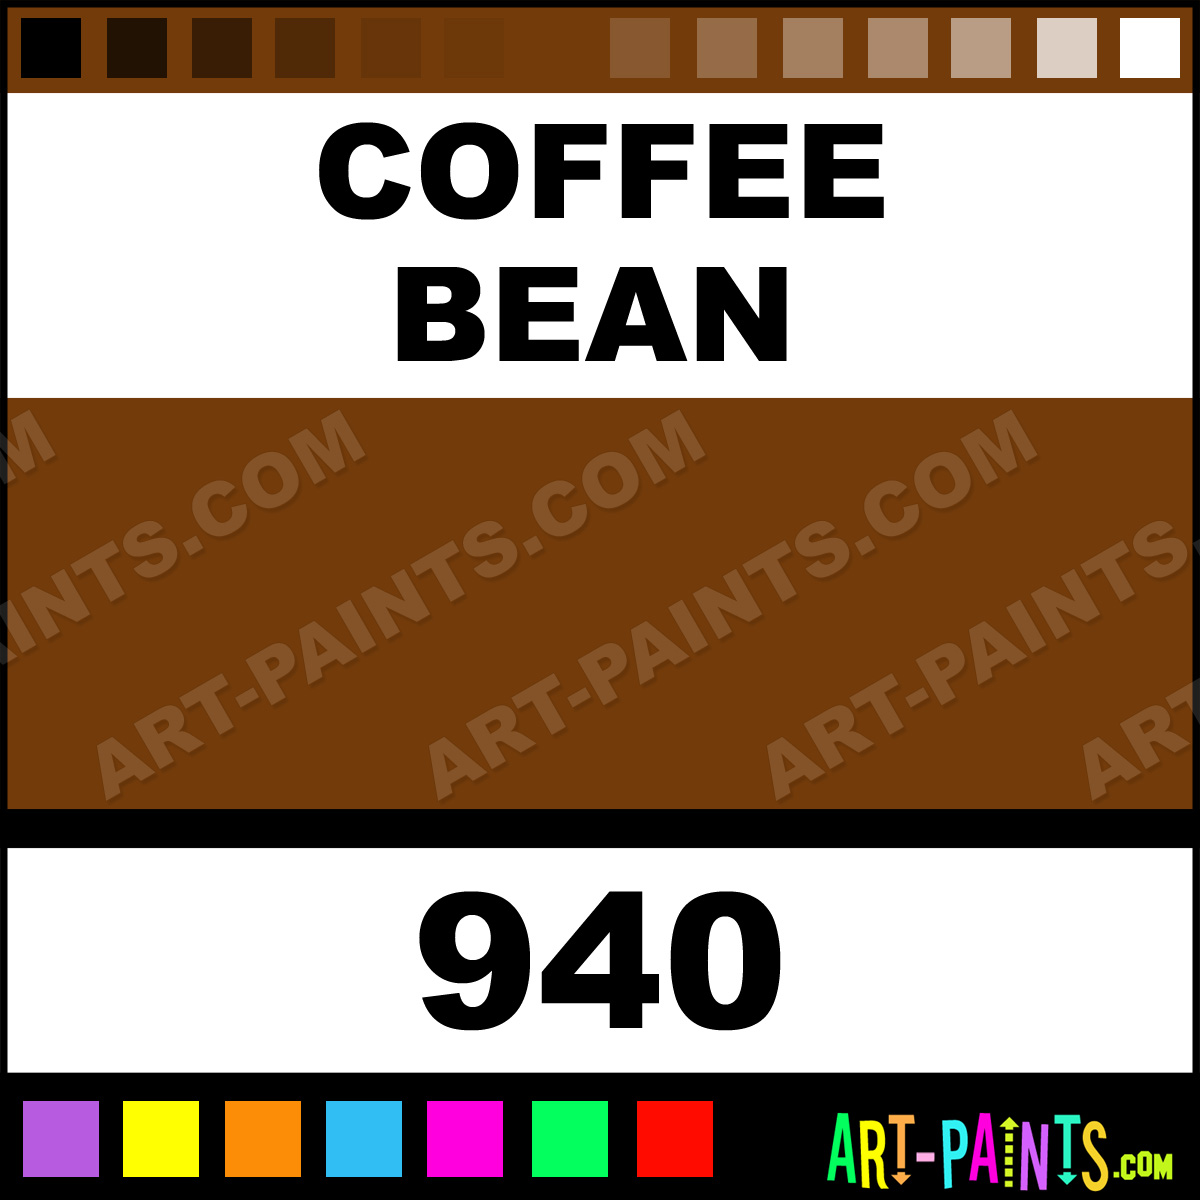 Coffee Bean Plaid Acrylic Paints 940 Coffee Bean Paint